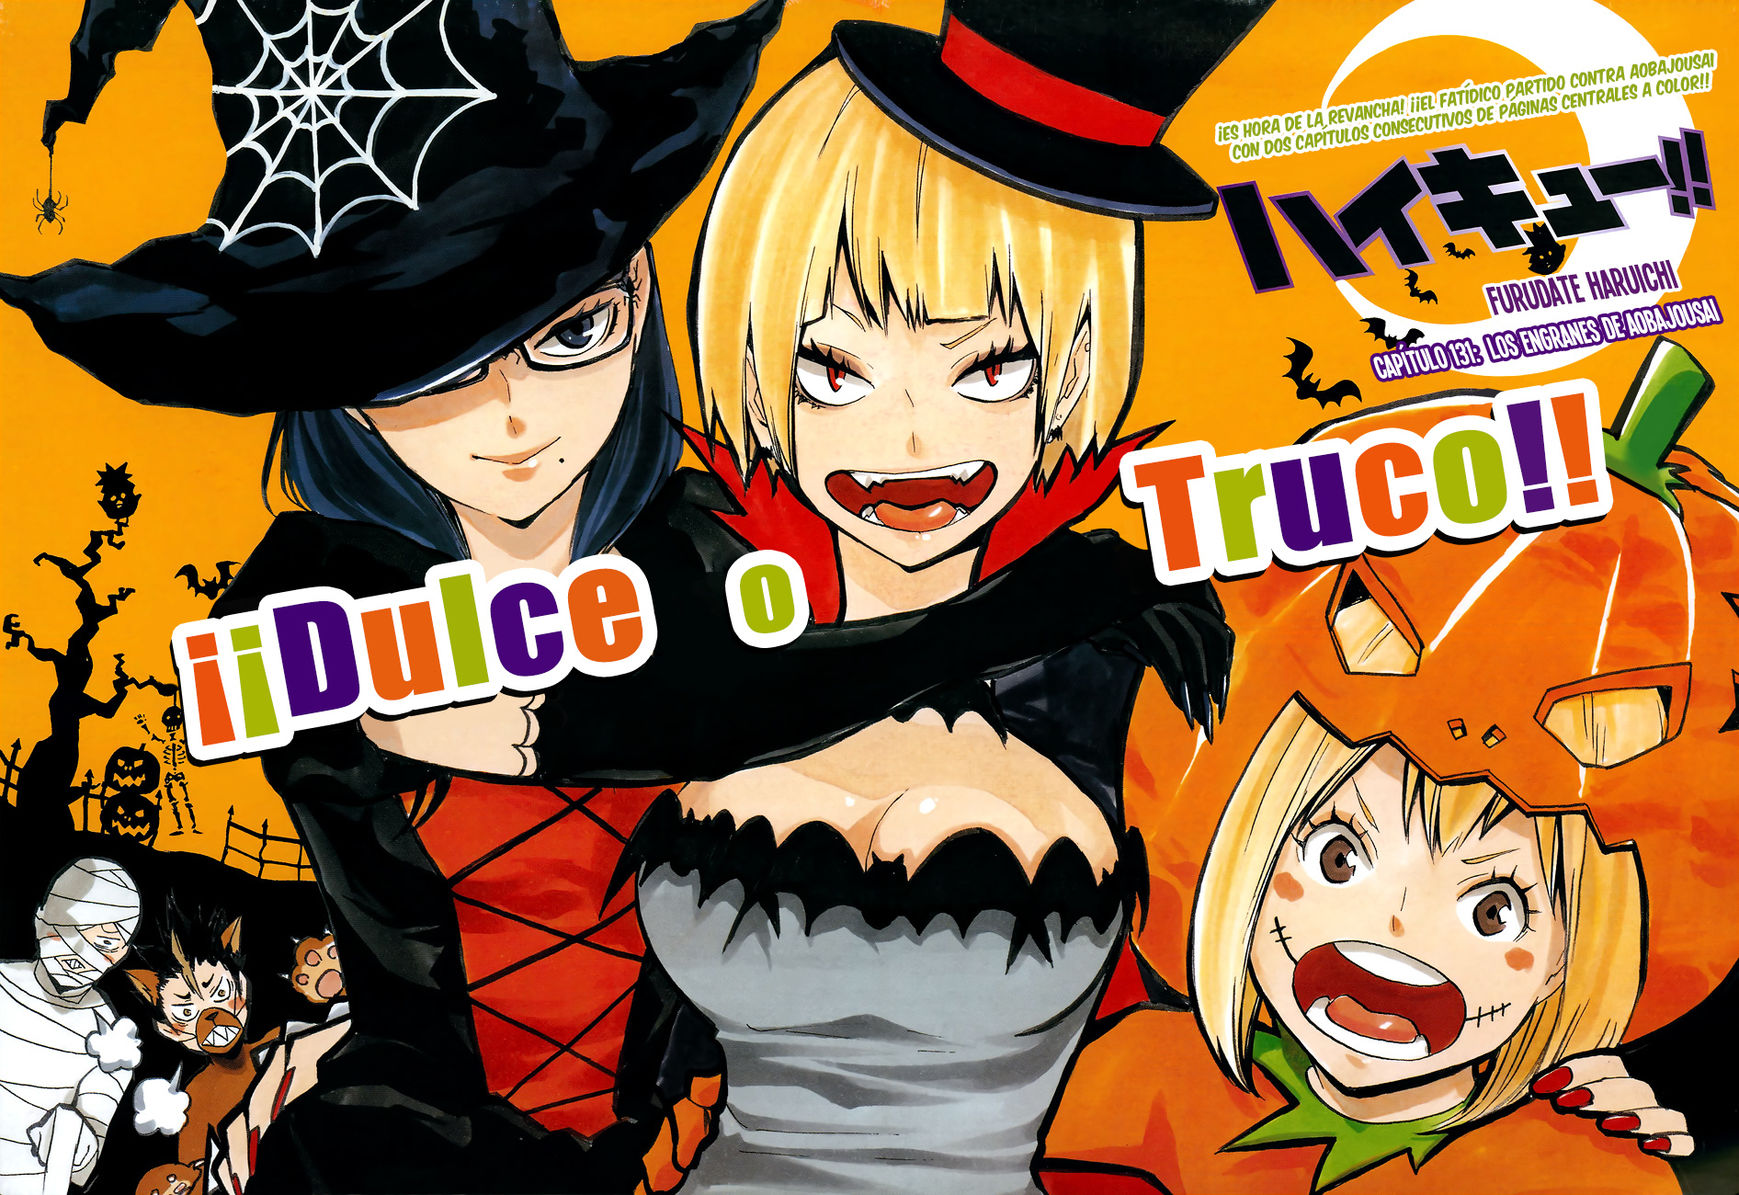 http://c5.ninemanga.com/es_manga/10/10/190168/5fa165118522de3e081998382065dda3.jpg Page 2